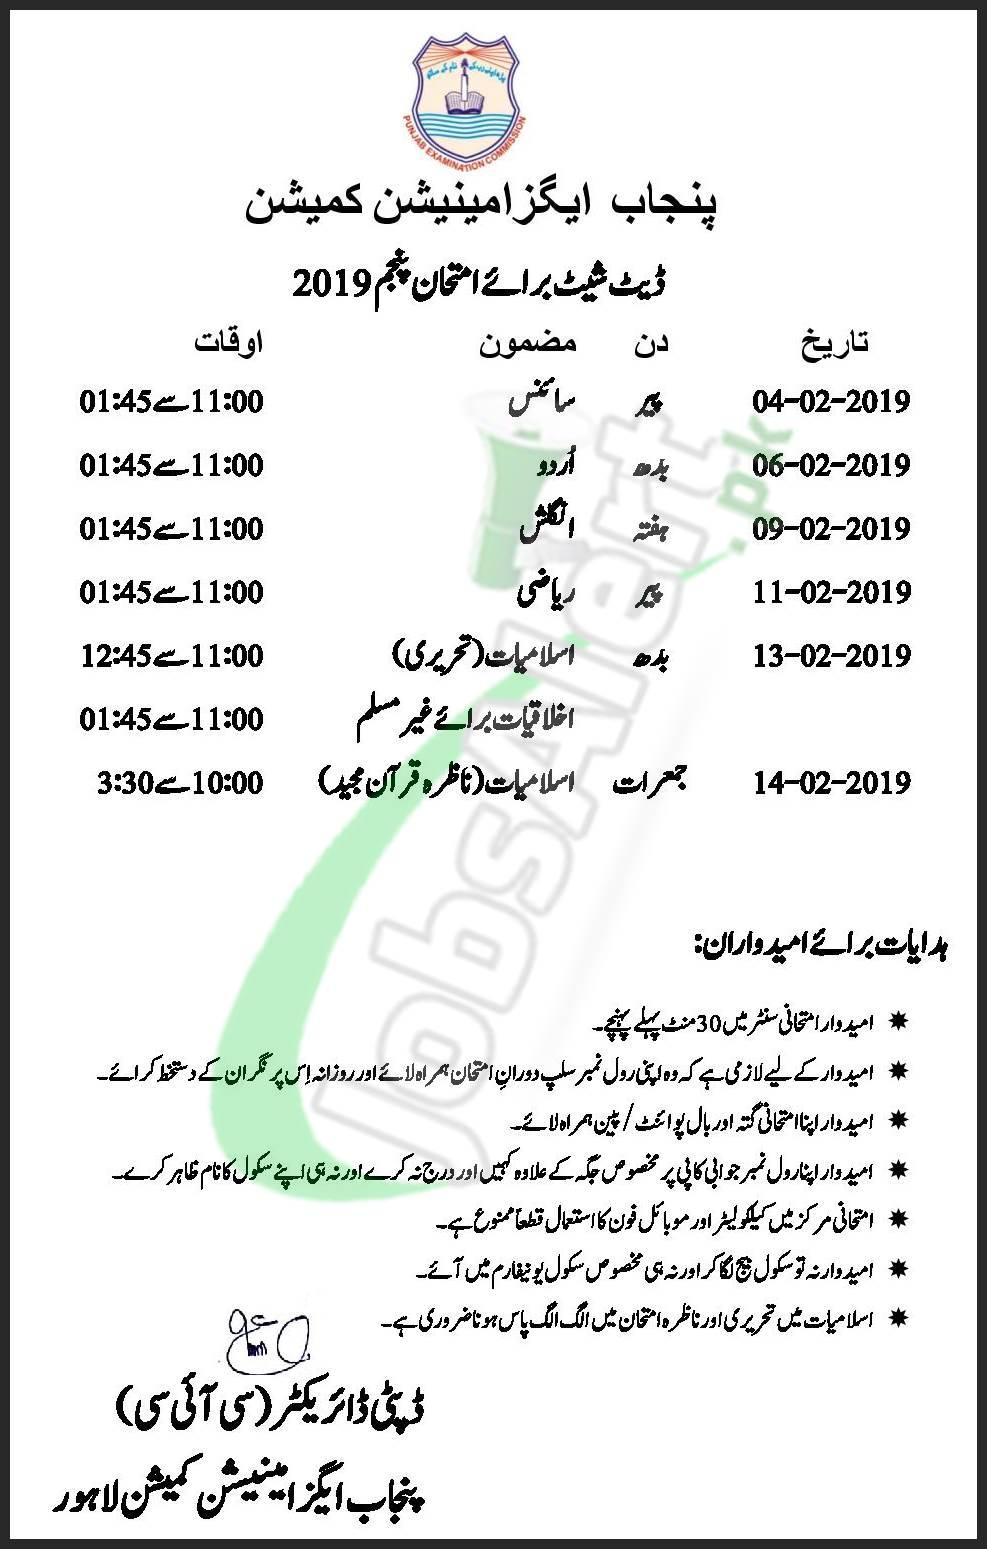 PEC 5th Class Date Sheet 2019